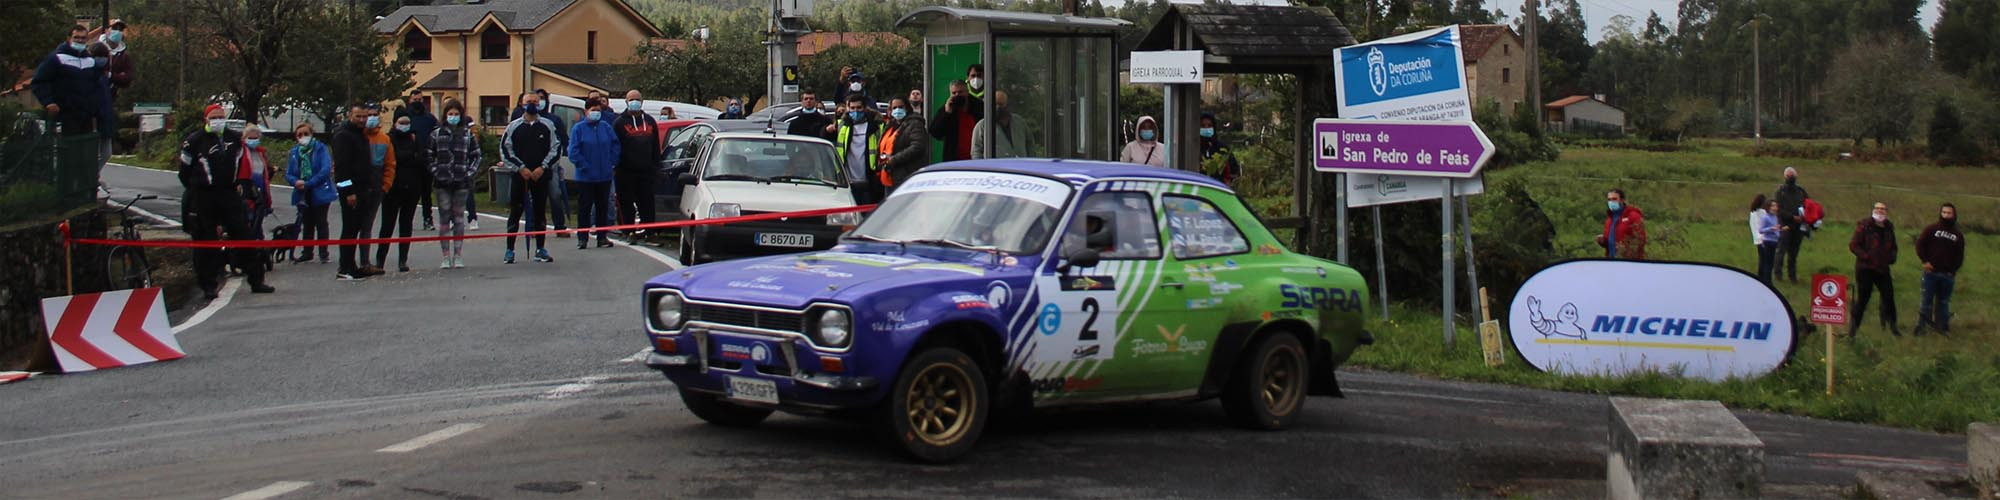 CERVH + TER Historic: Rallye Rias Altas Histórico [2-3 Octubre] 00